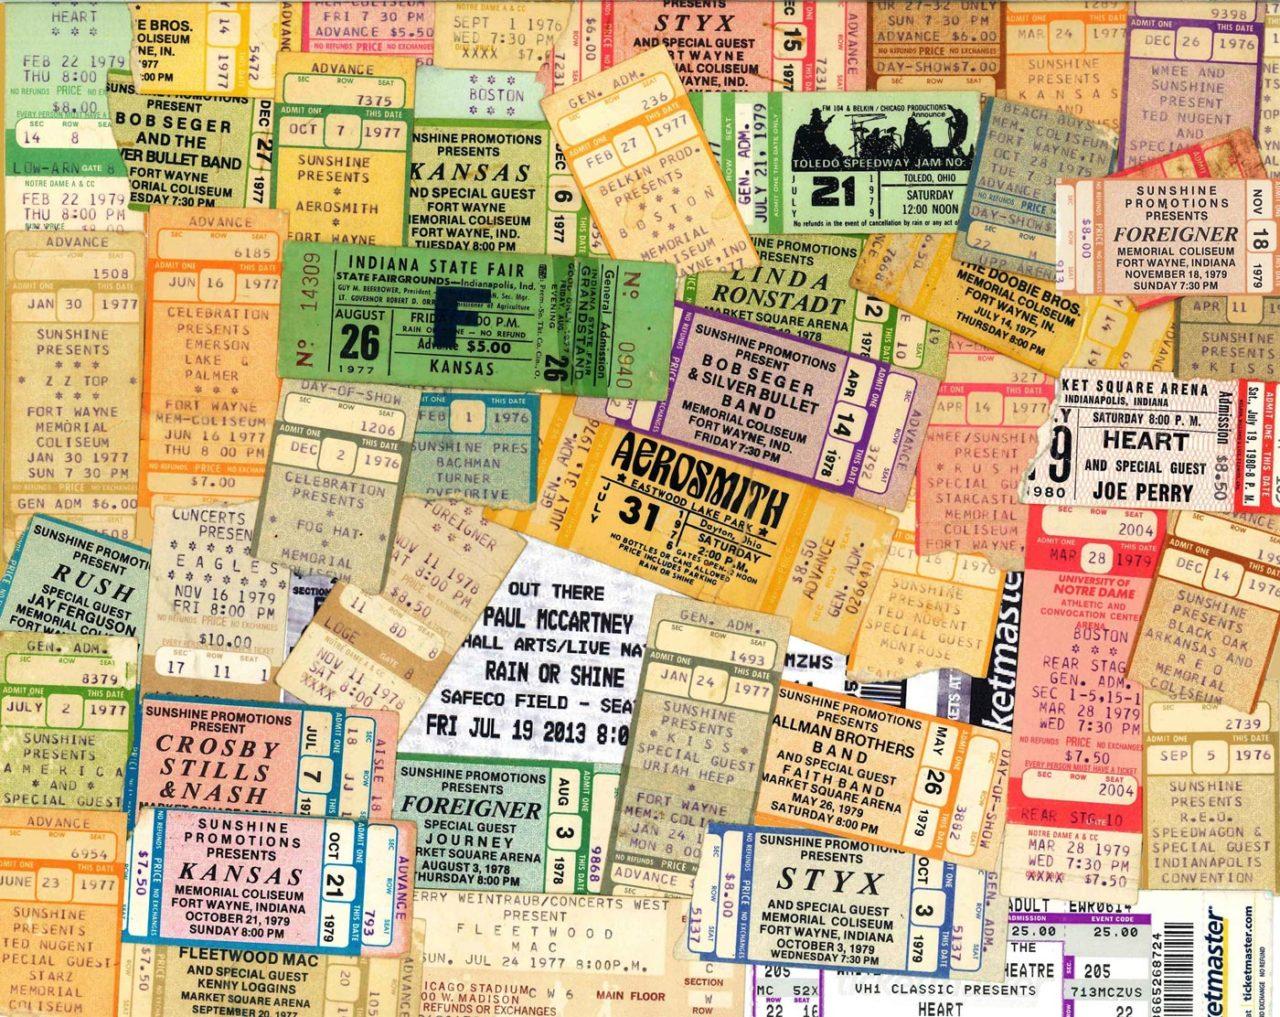 https://thesubmarine.it/wp-content/uploads/2016/11/background-concert-ticket-stubs-1-1280x1017.jpg